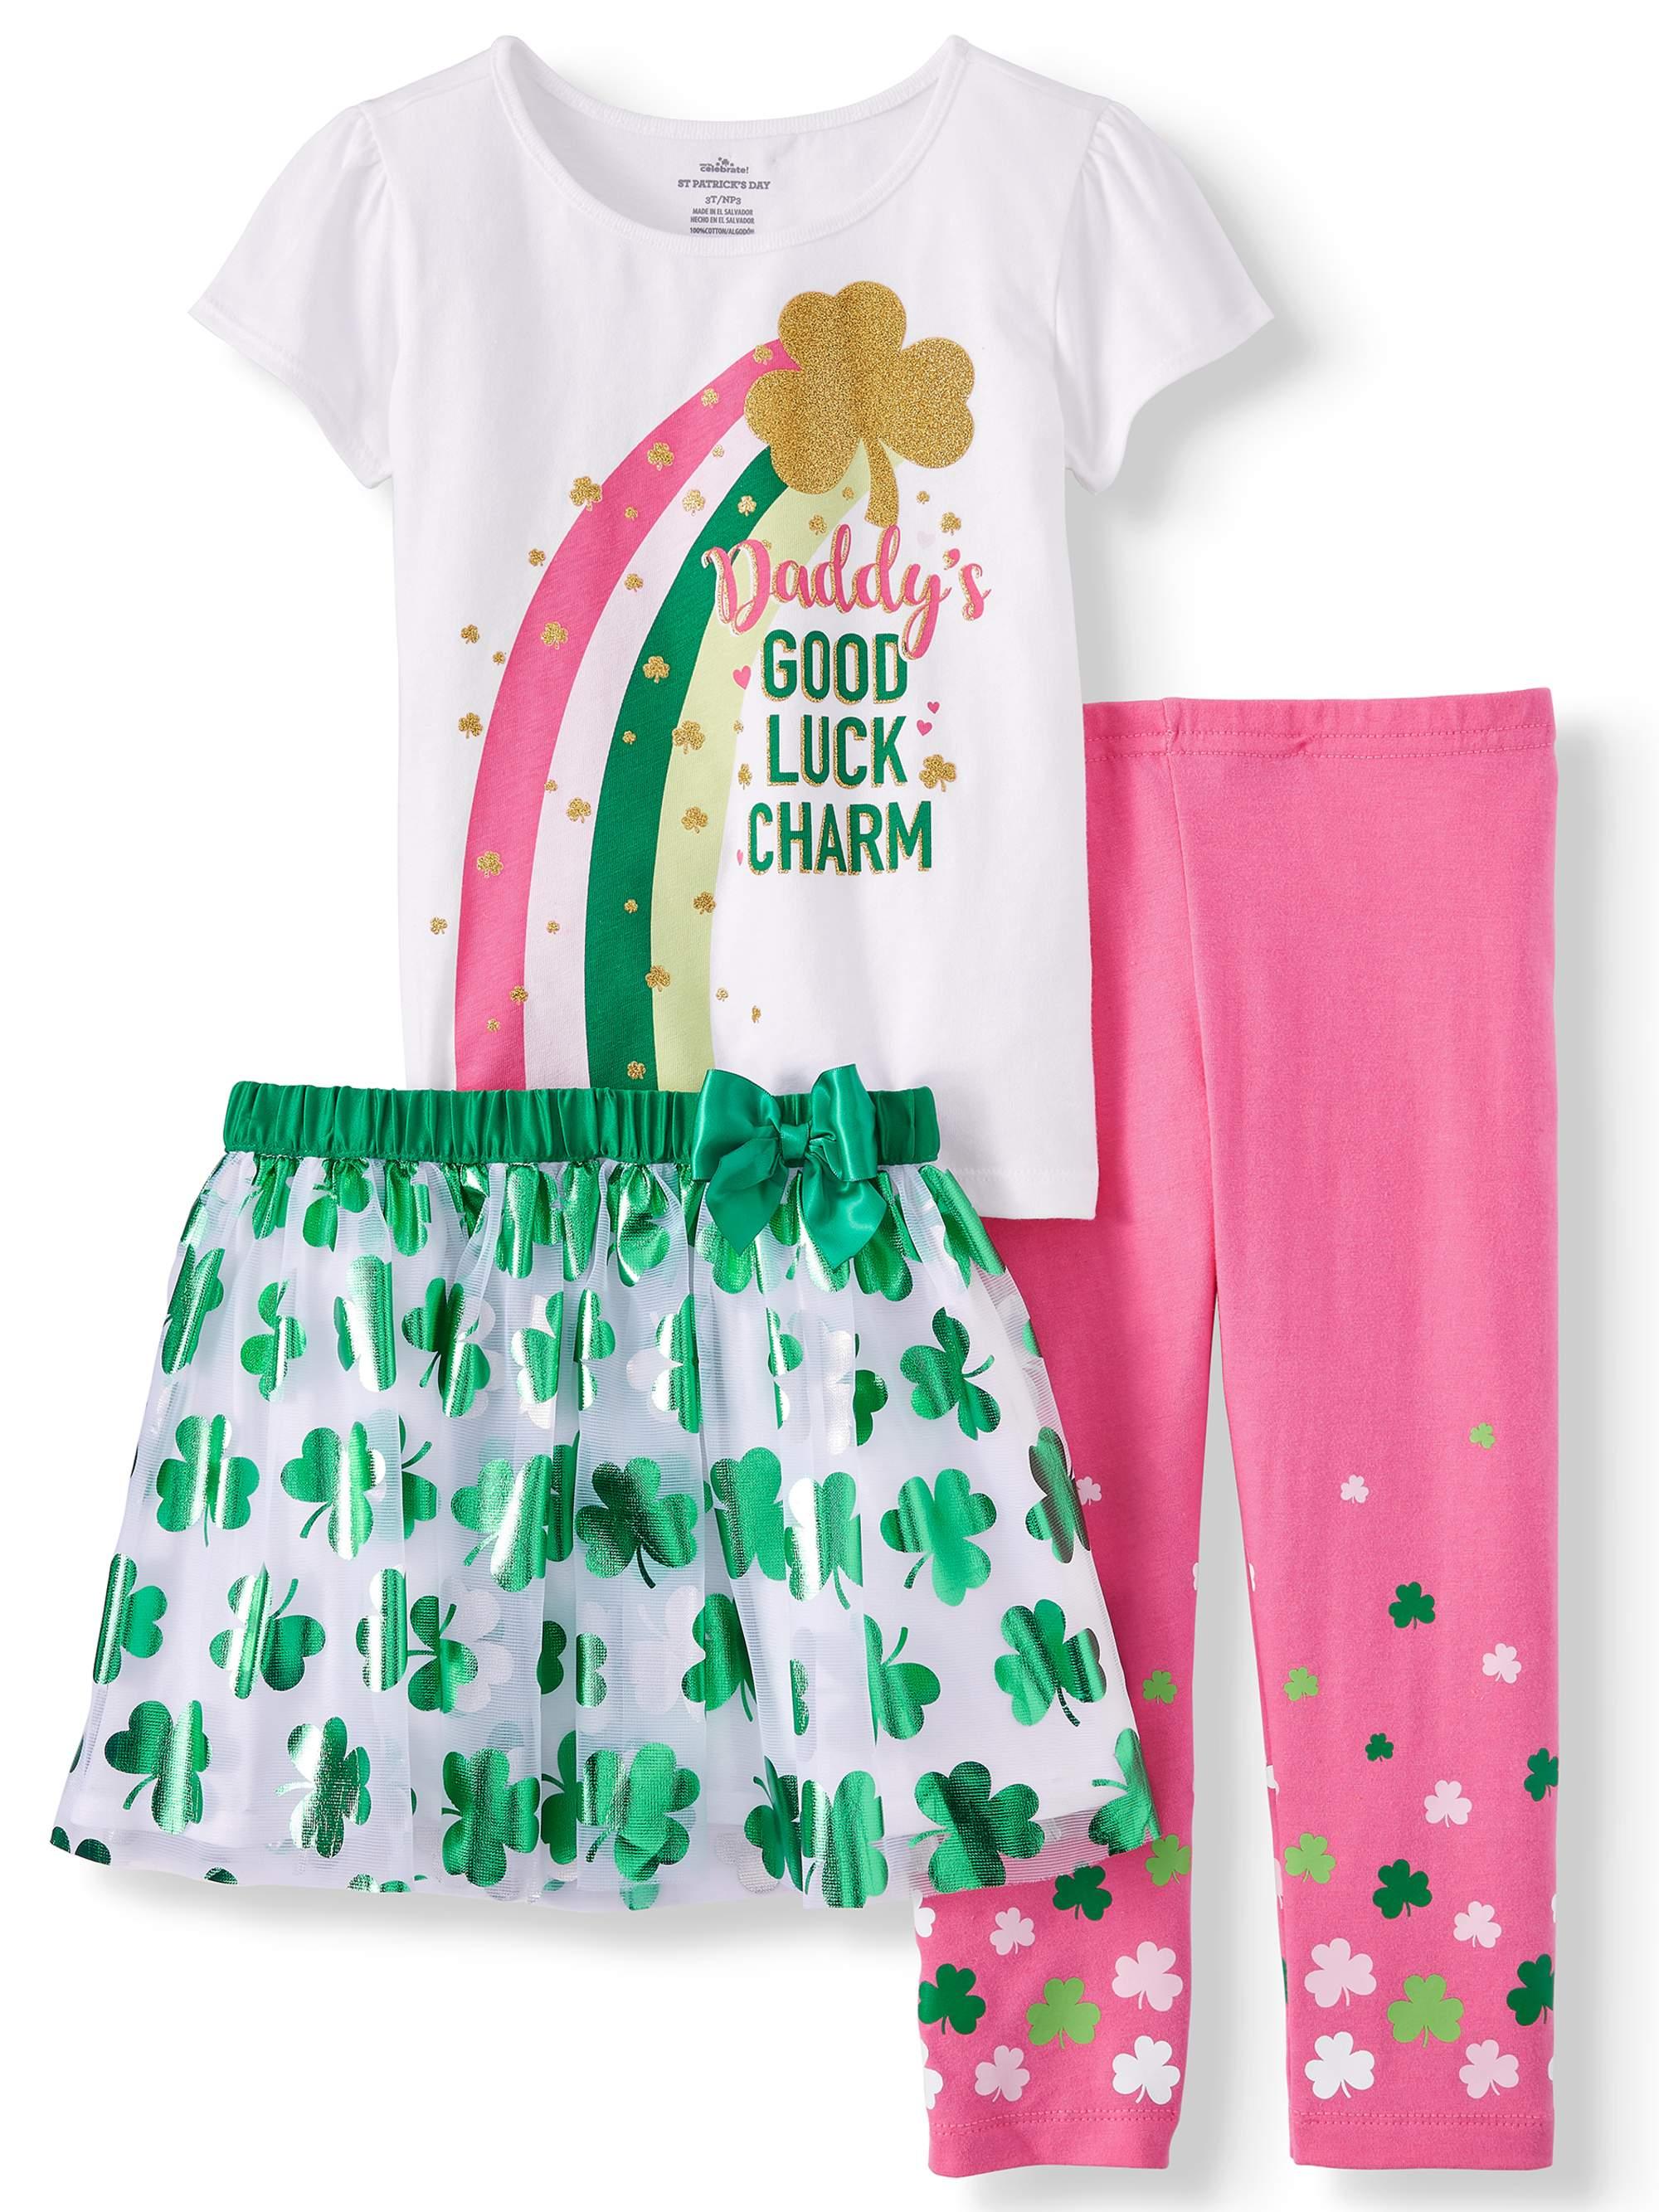 St. Patrick's Day Short Sleeve T-Shirt, Leggings & Tutu, 3pc Outfit Set (Toddler Girls) $5.5